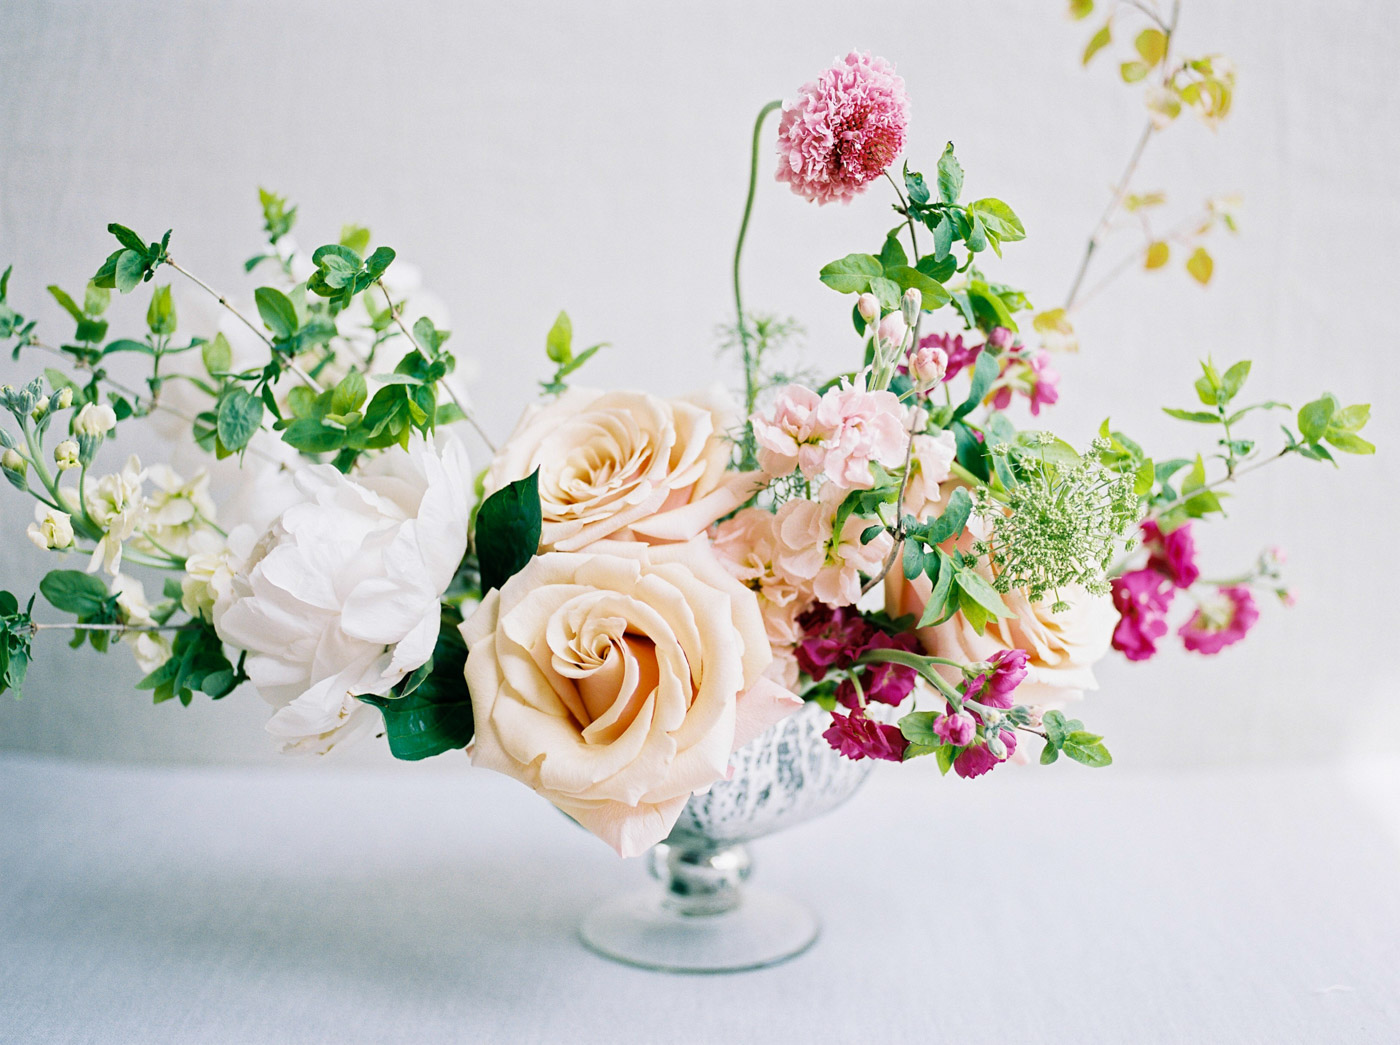 toronto_wedding_photographer_spring_outdoor_wedding_inspiration-16.jpg